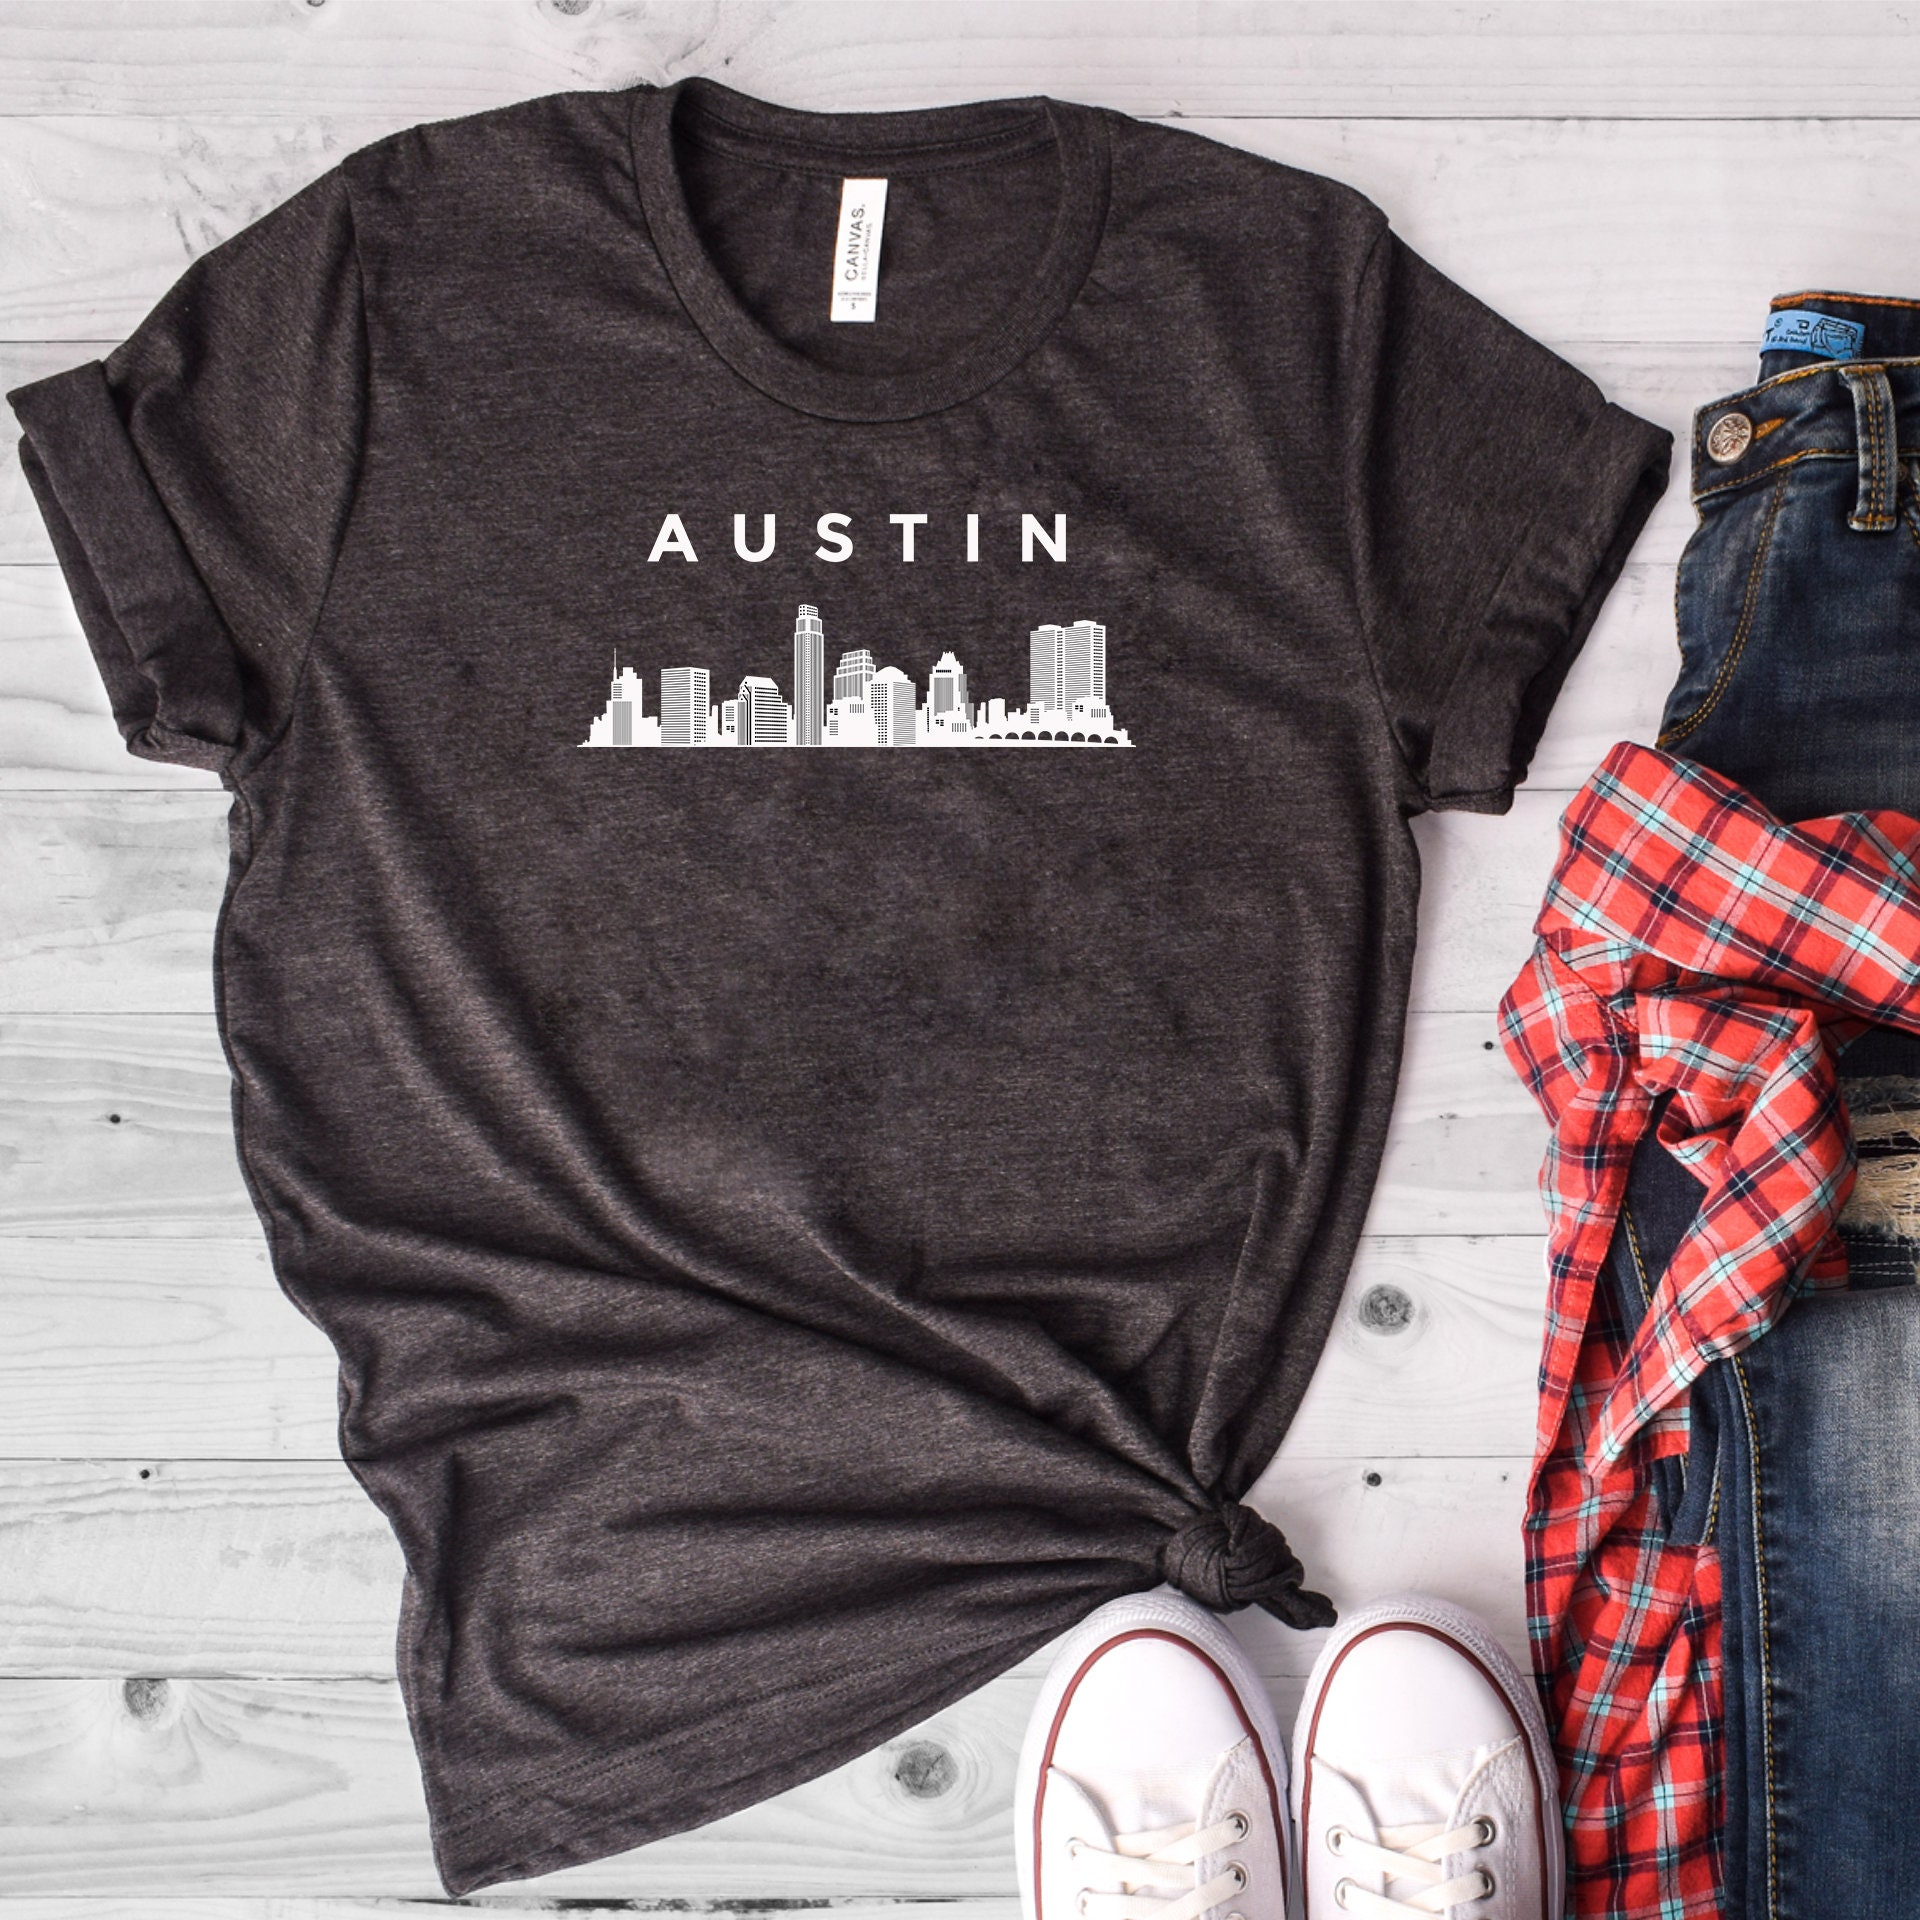 e0ec7a6b2779c T Shirt Shop Austin Tx « Alzheimer's Network of Oregon